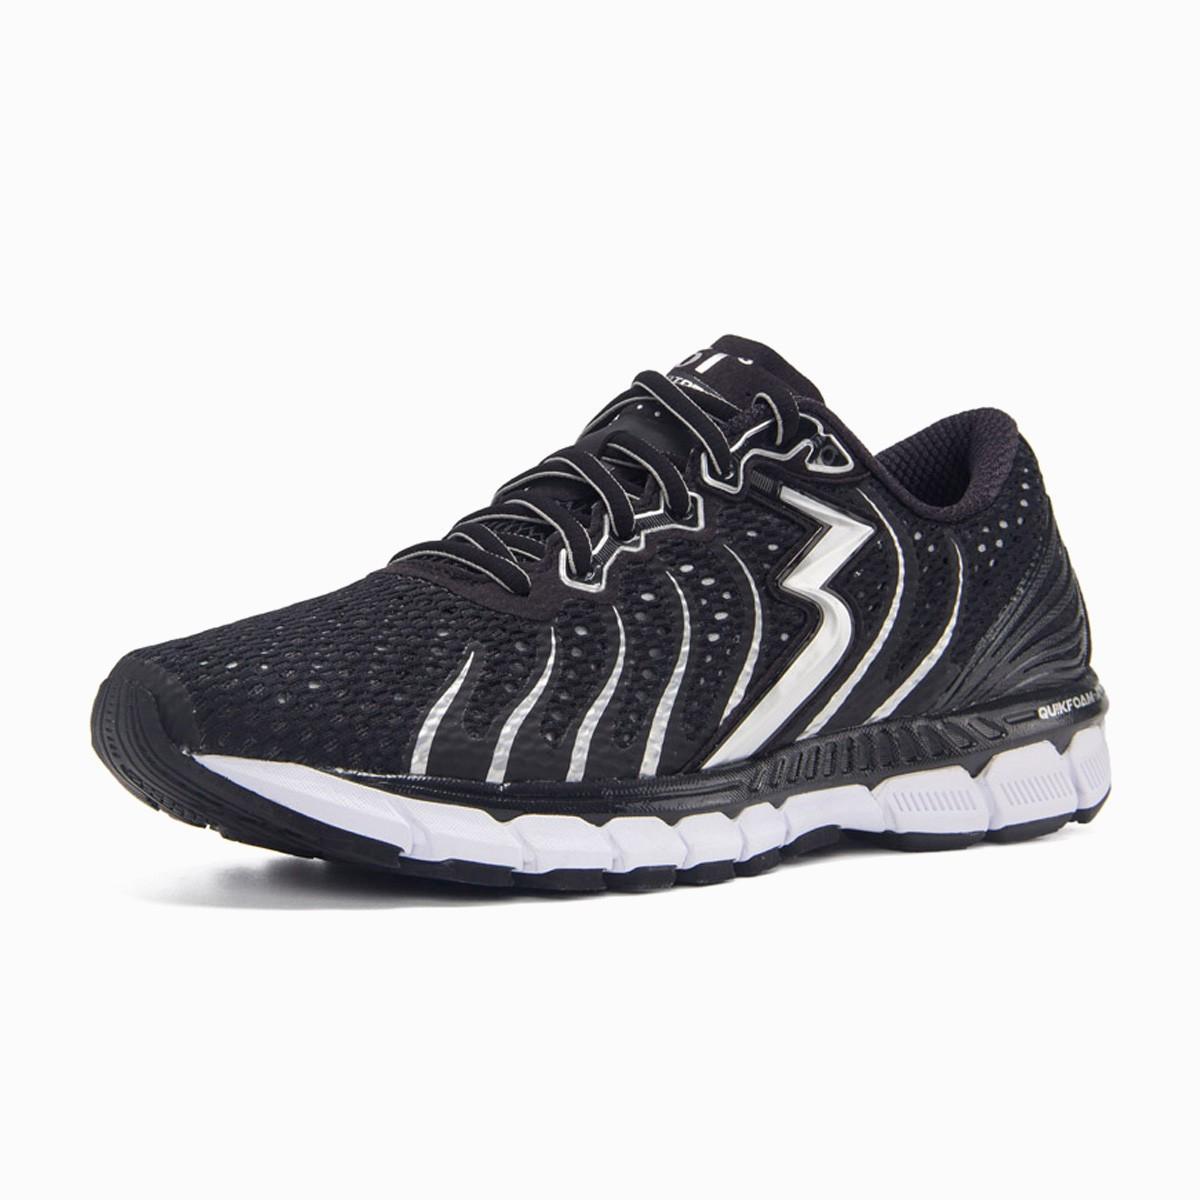 361° 男士跑鞋 Y711-1 黑色/银白色 39